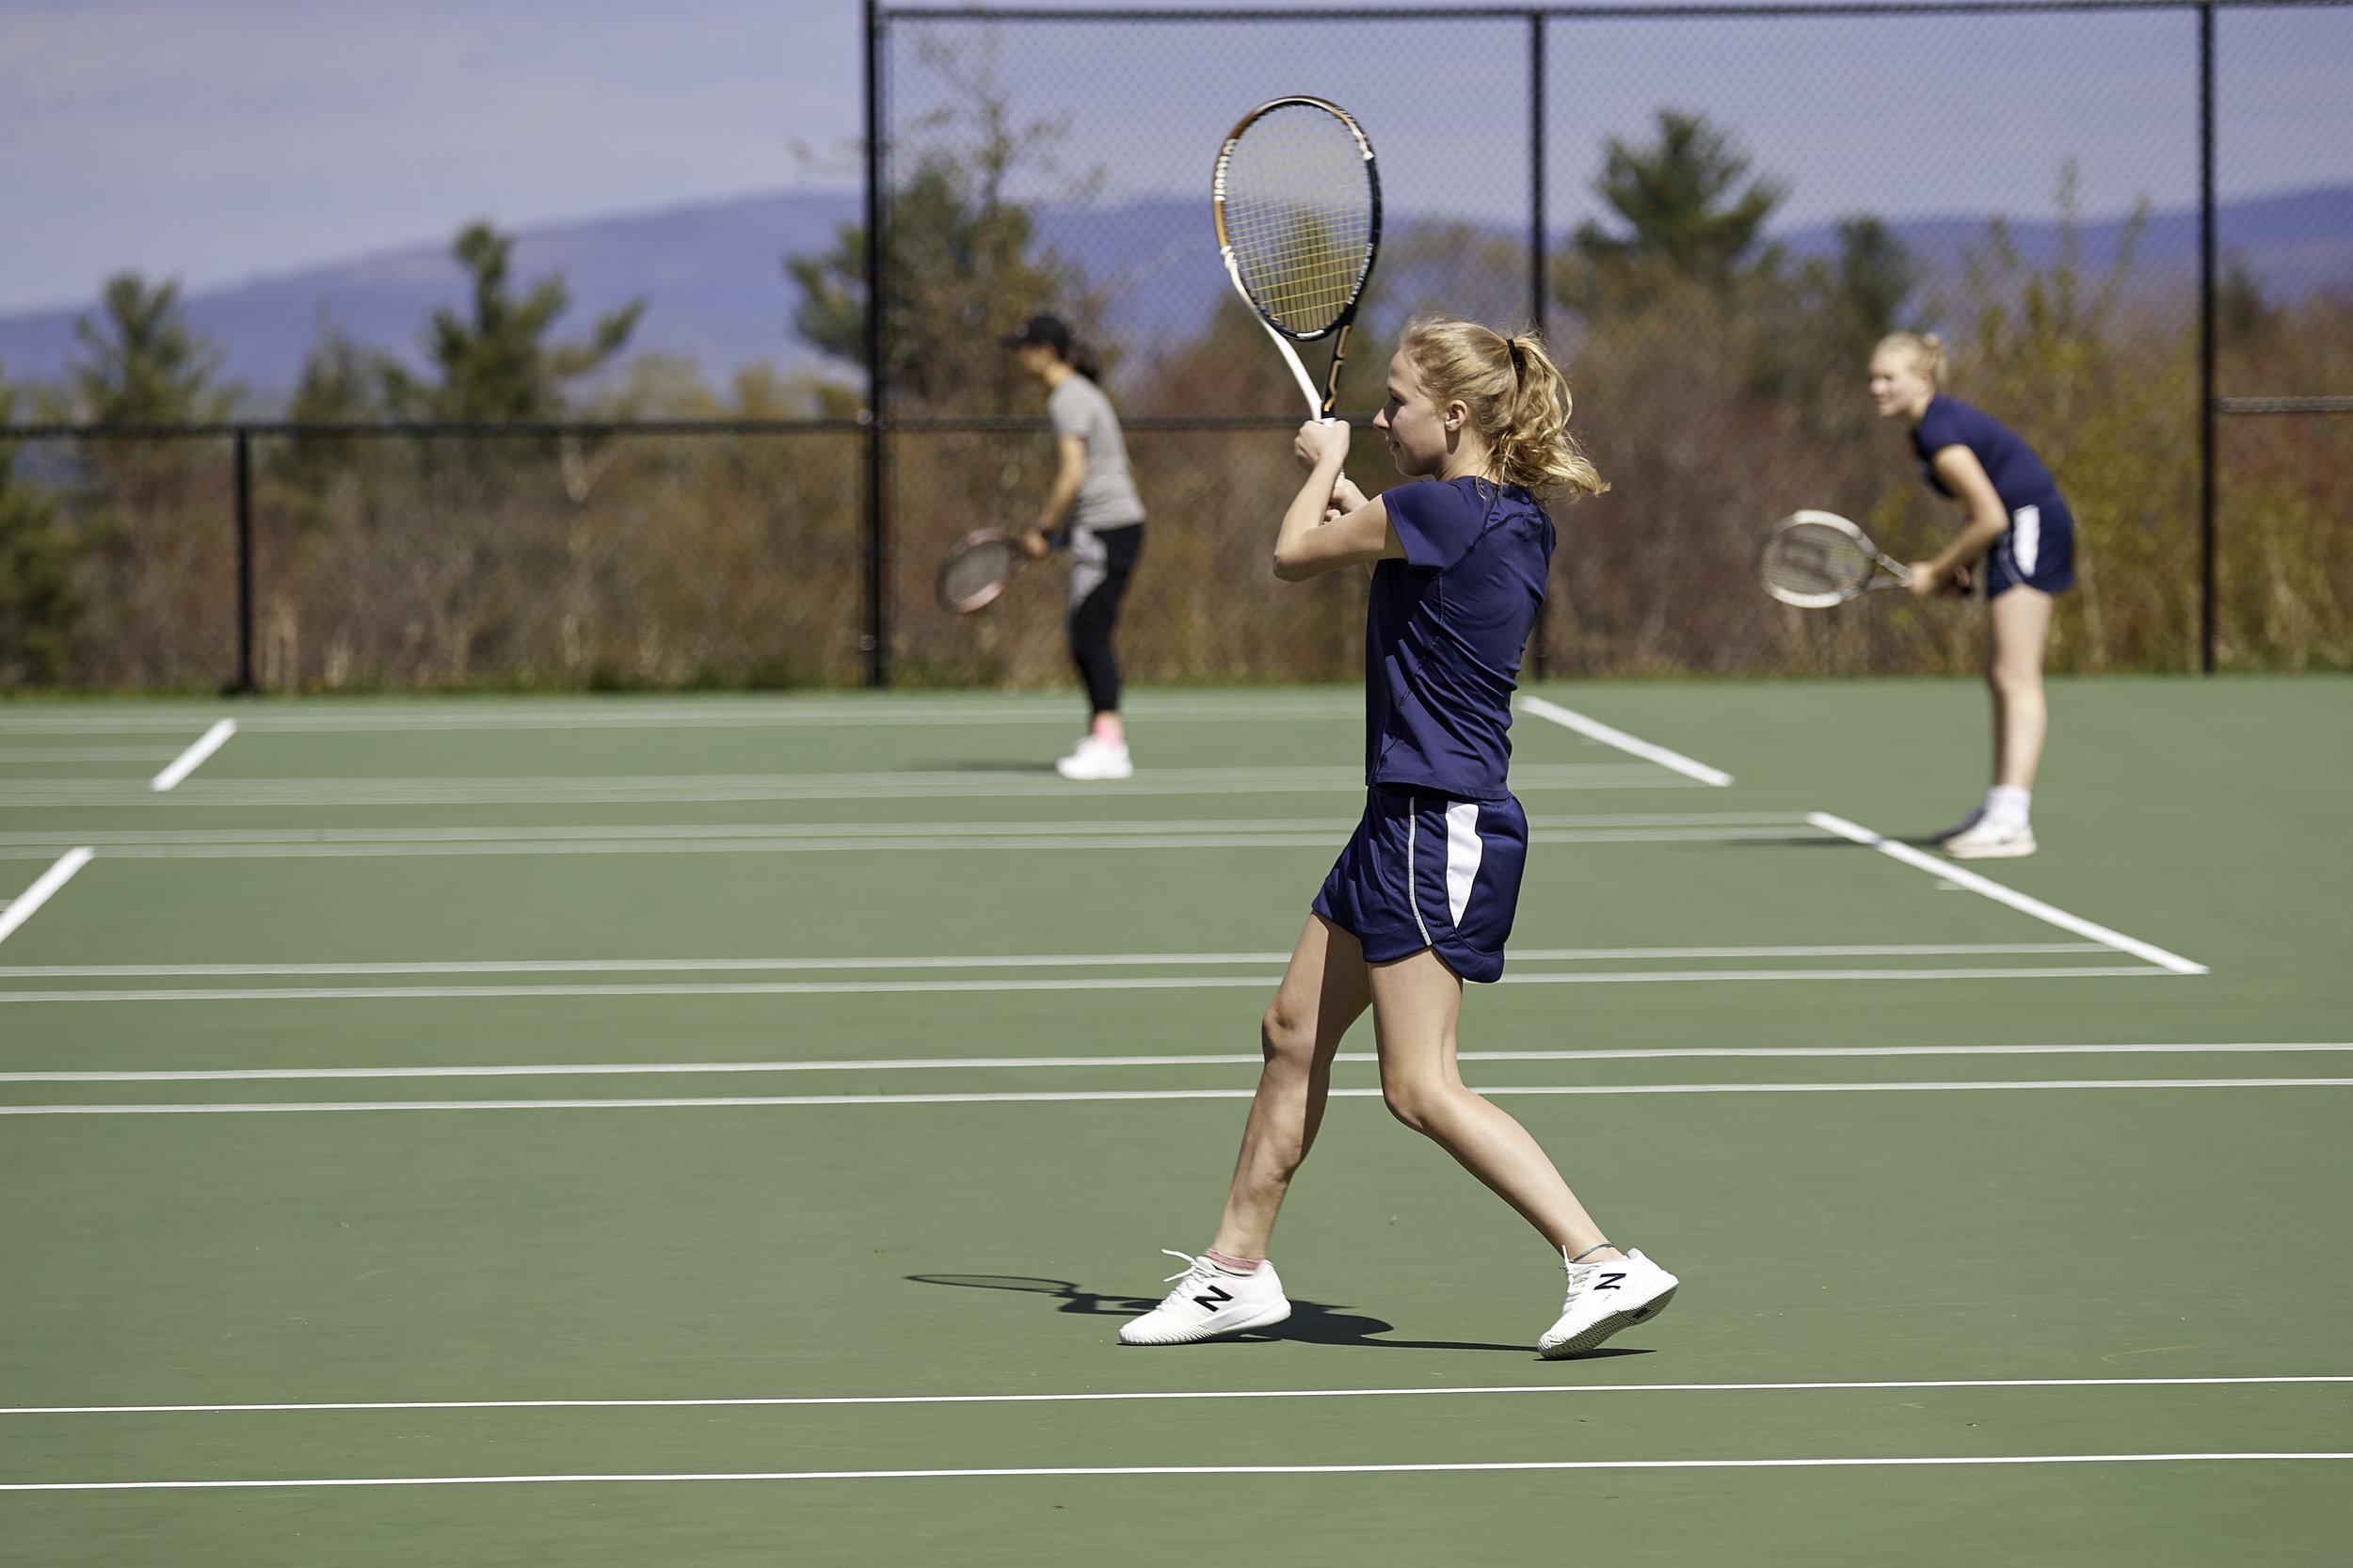 Girls Tennis vs. Winchendon School - May 15, 2019 -195181.jpg